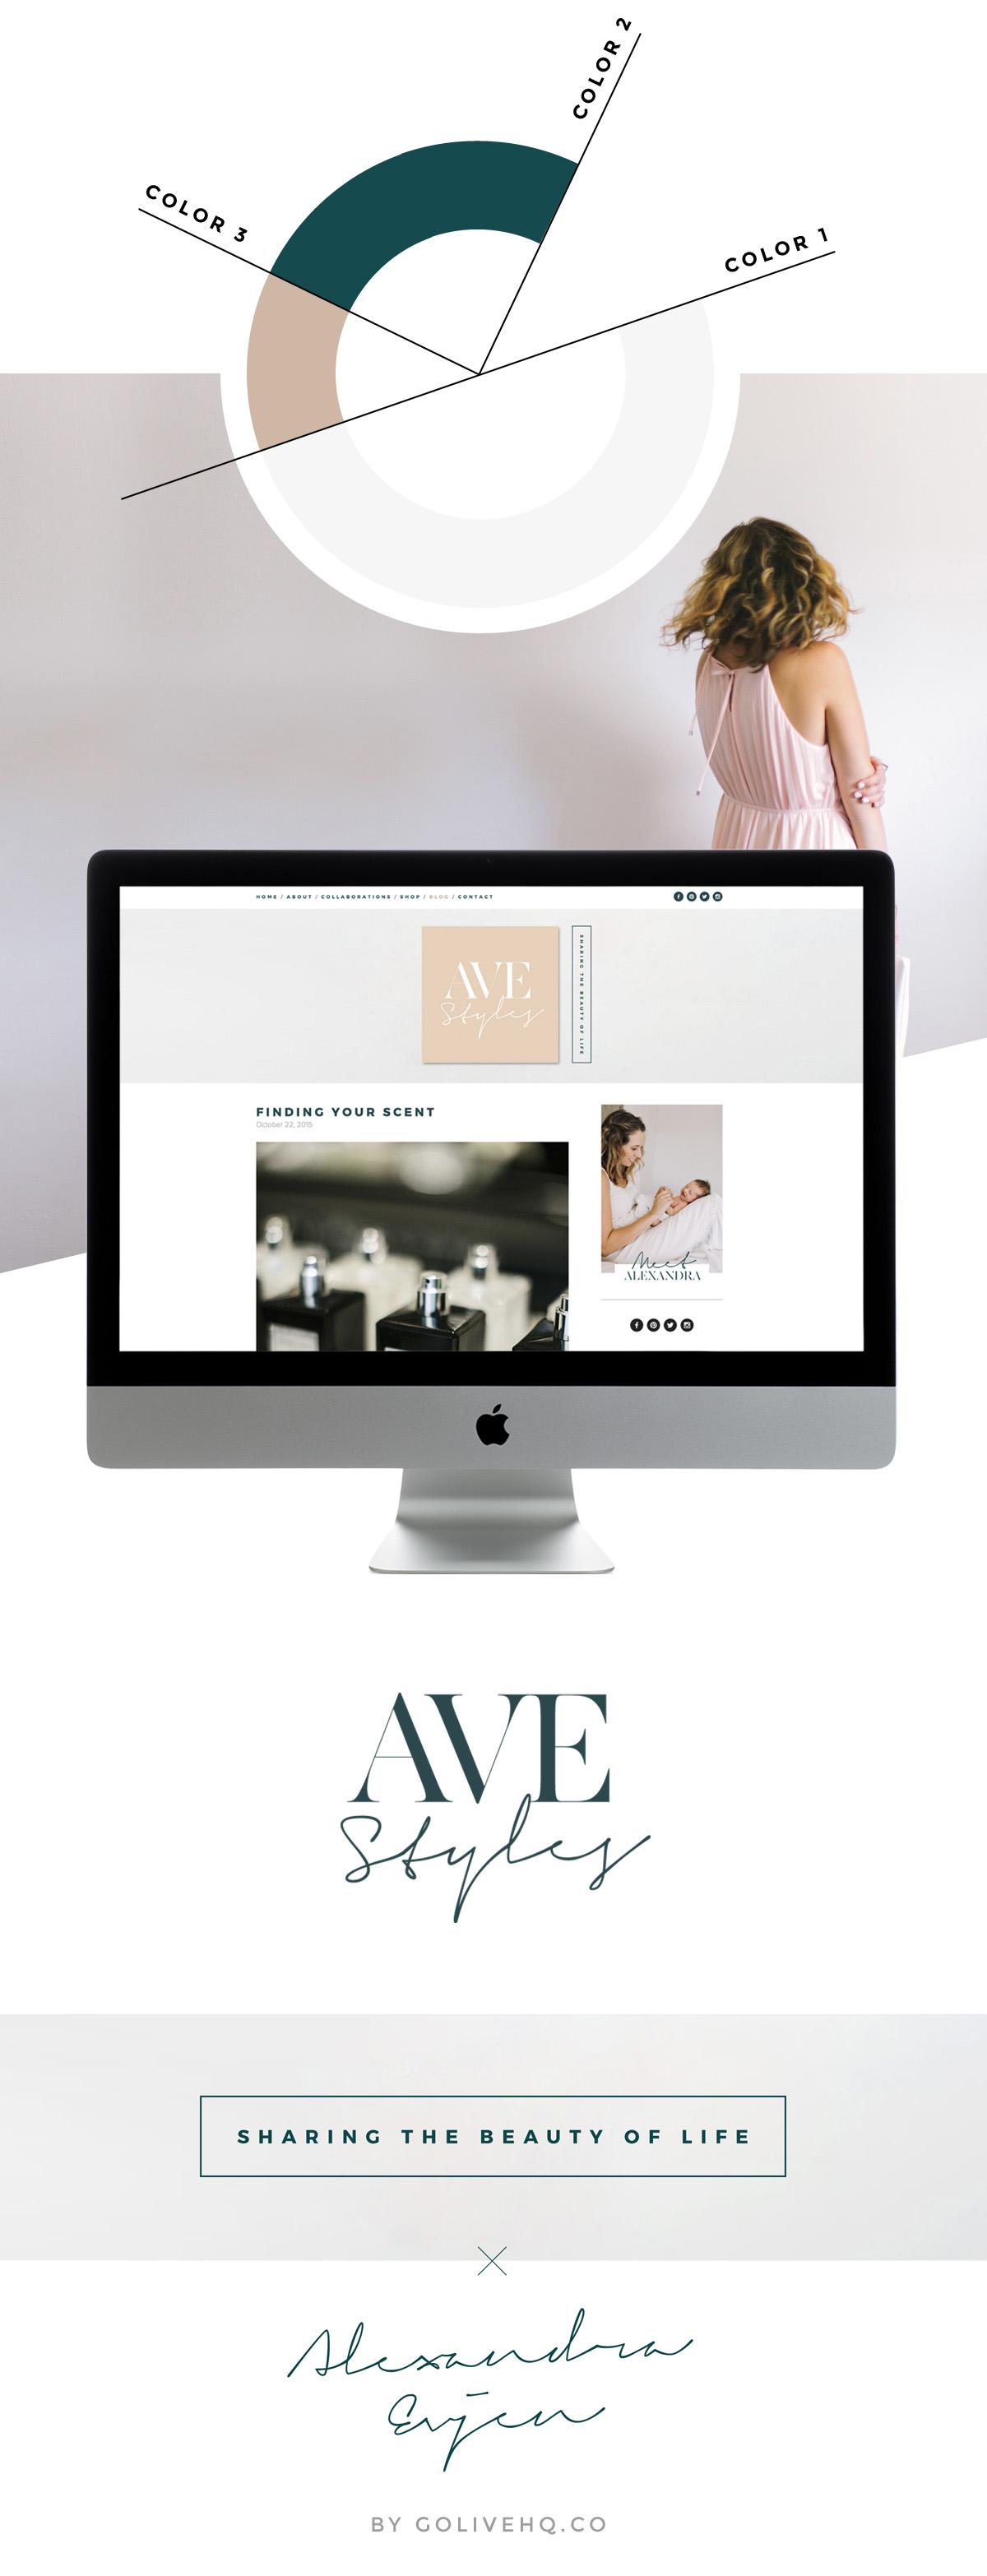 squarespace fashion blog design       by GOLIVEHQ.CO